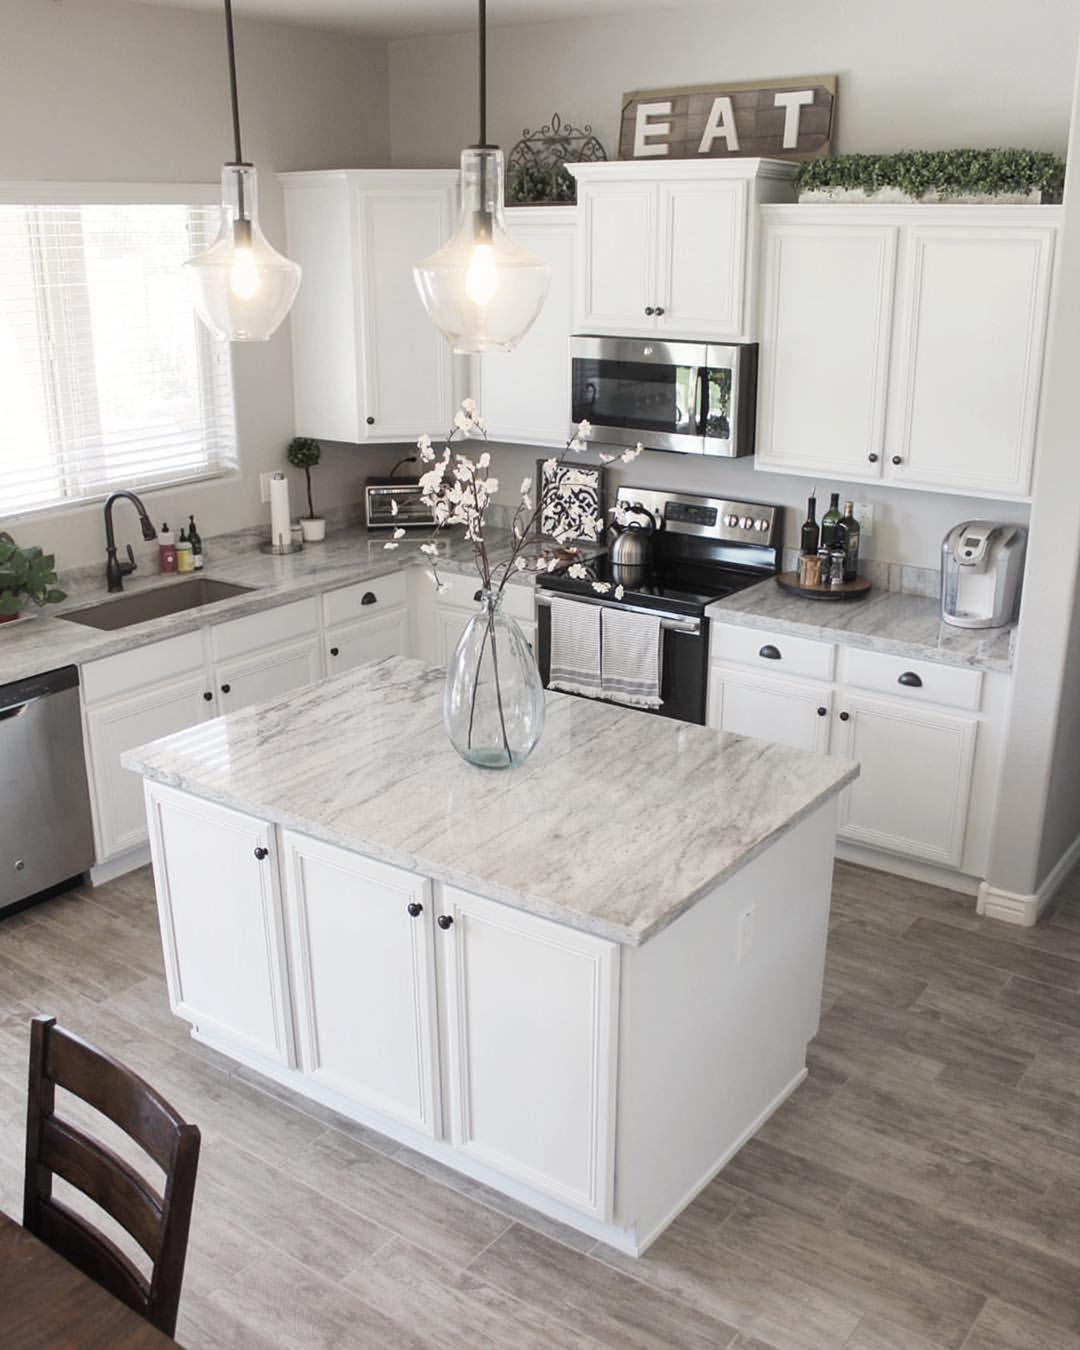 10 Elegant White Kitchen Design Ideas For More Comfortable